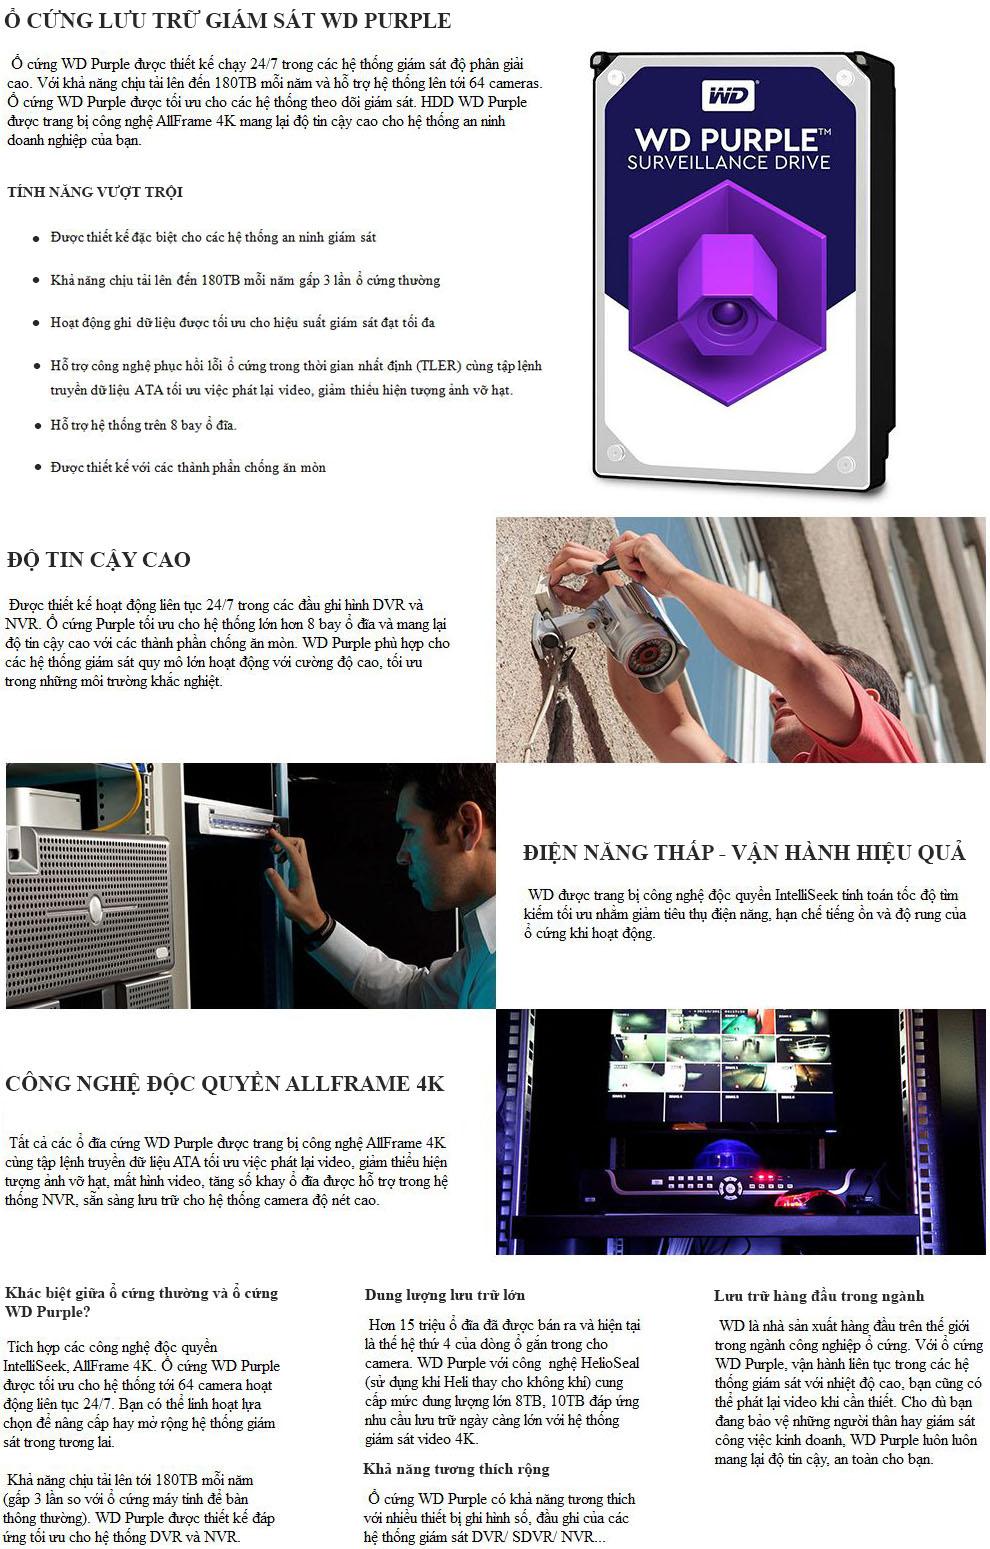 ổ cứng Western Purple tím